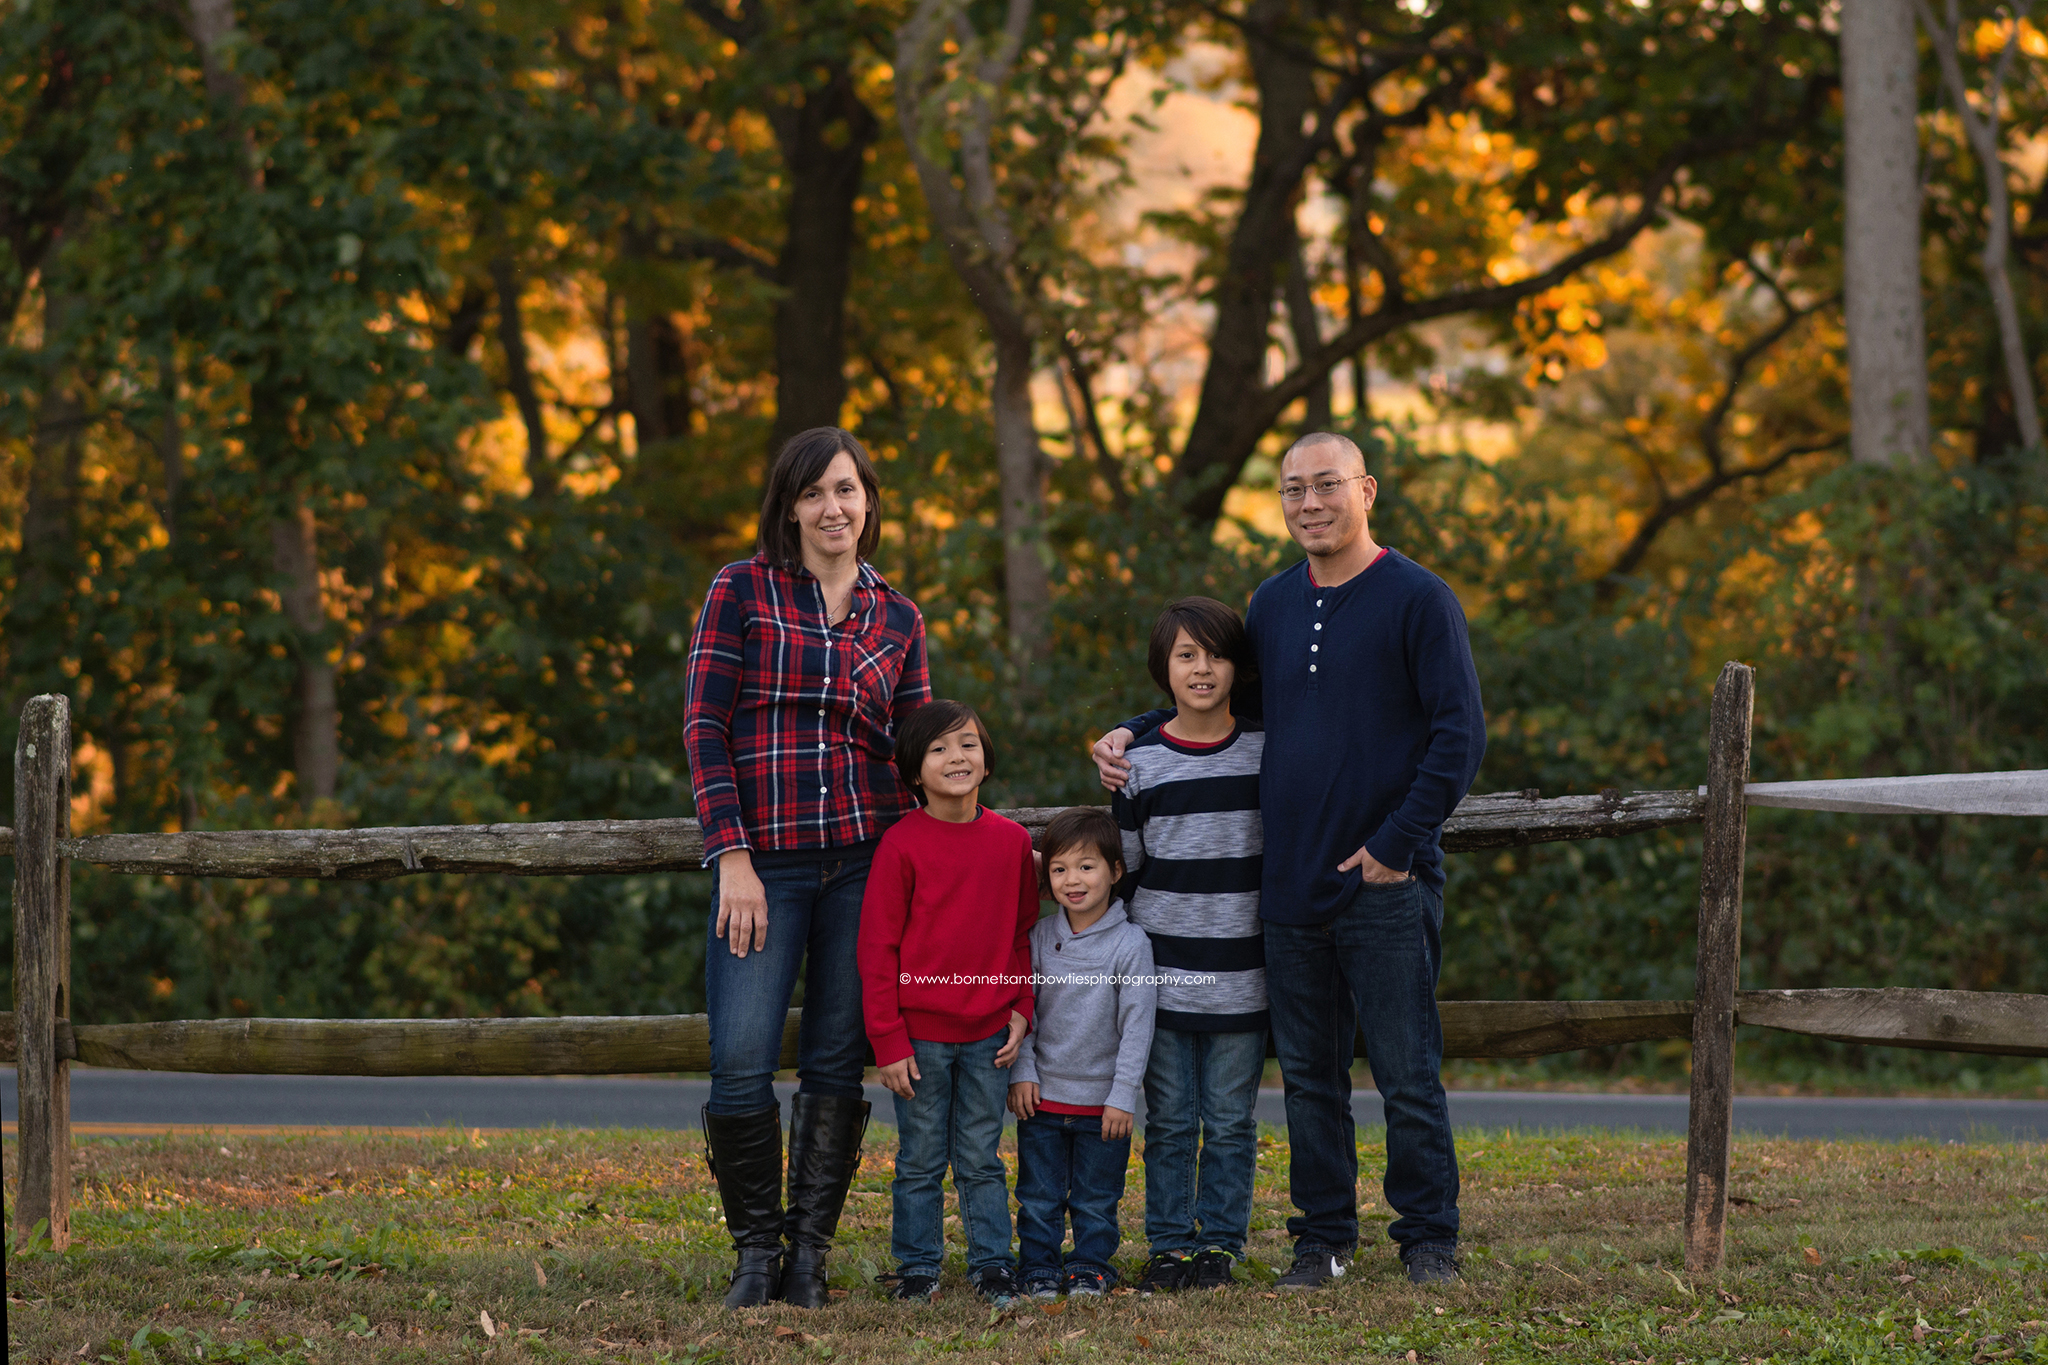 family portrait session in york pa.jpg